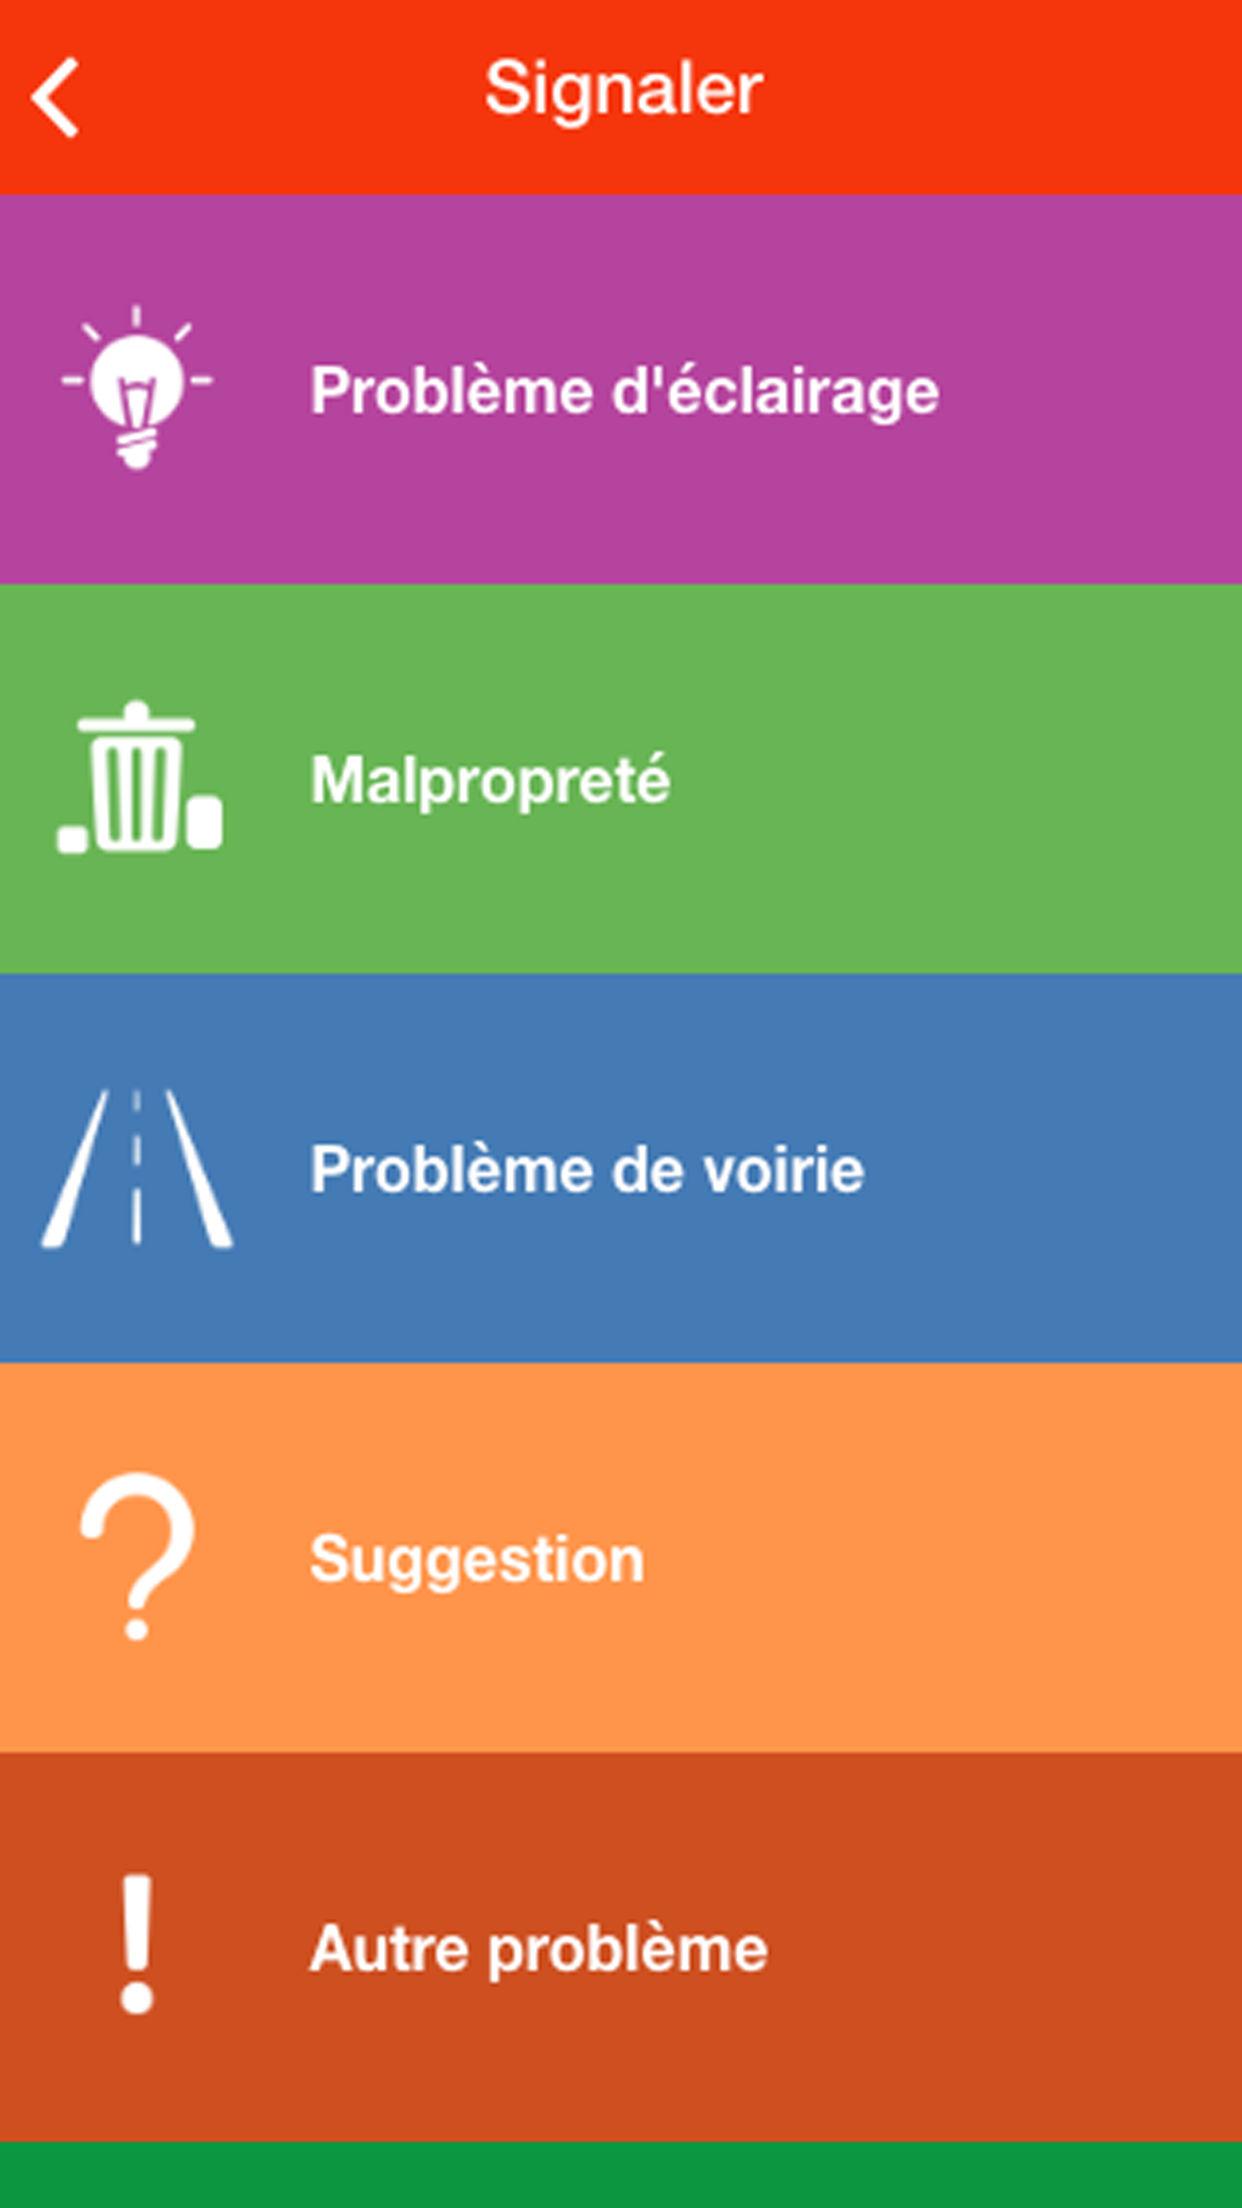 mairie d'Amenucourt - signalement-photo - appli mobile mymairie